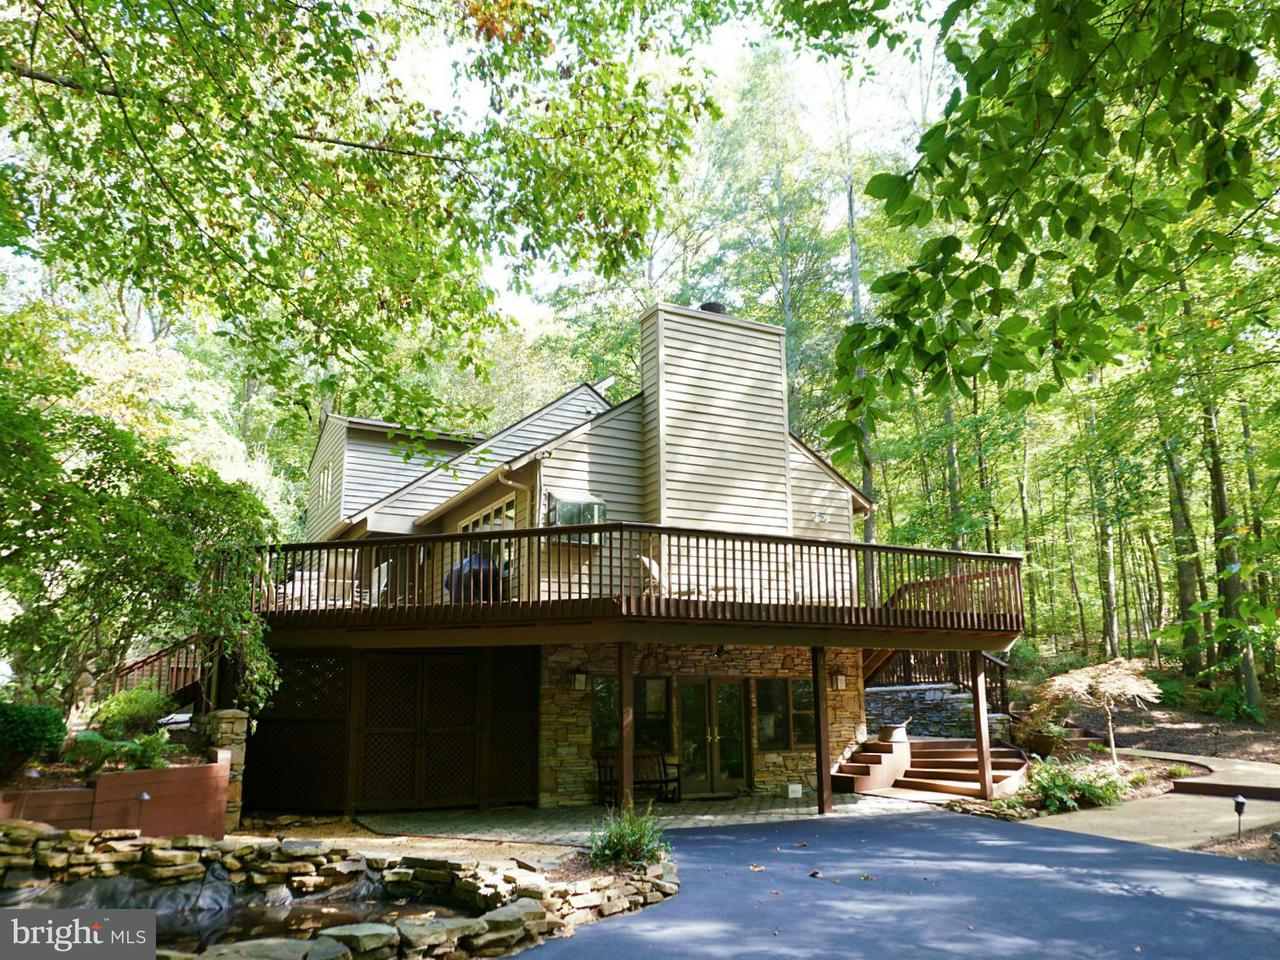 Single Family Home for Sale at 10009 WISAKON Trail 10009 WISAKON Trail Manassas, Virginia 20111 United States